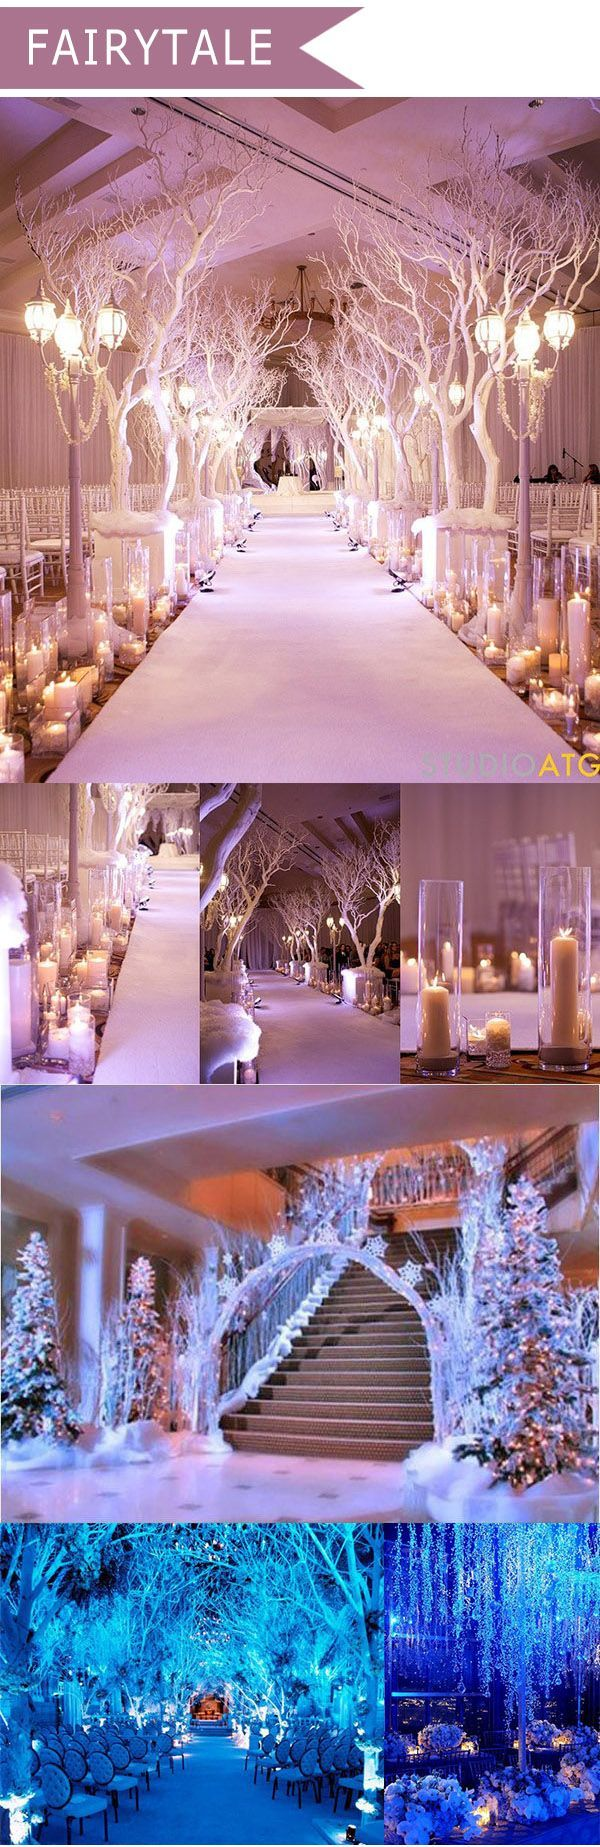 Fairytale Themed Wedding Decoration Ideas For 2016 Trends